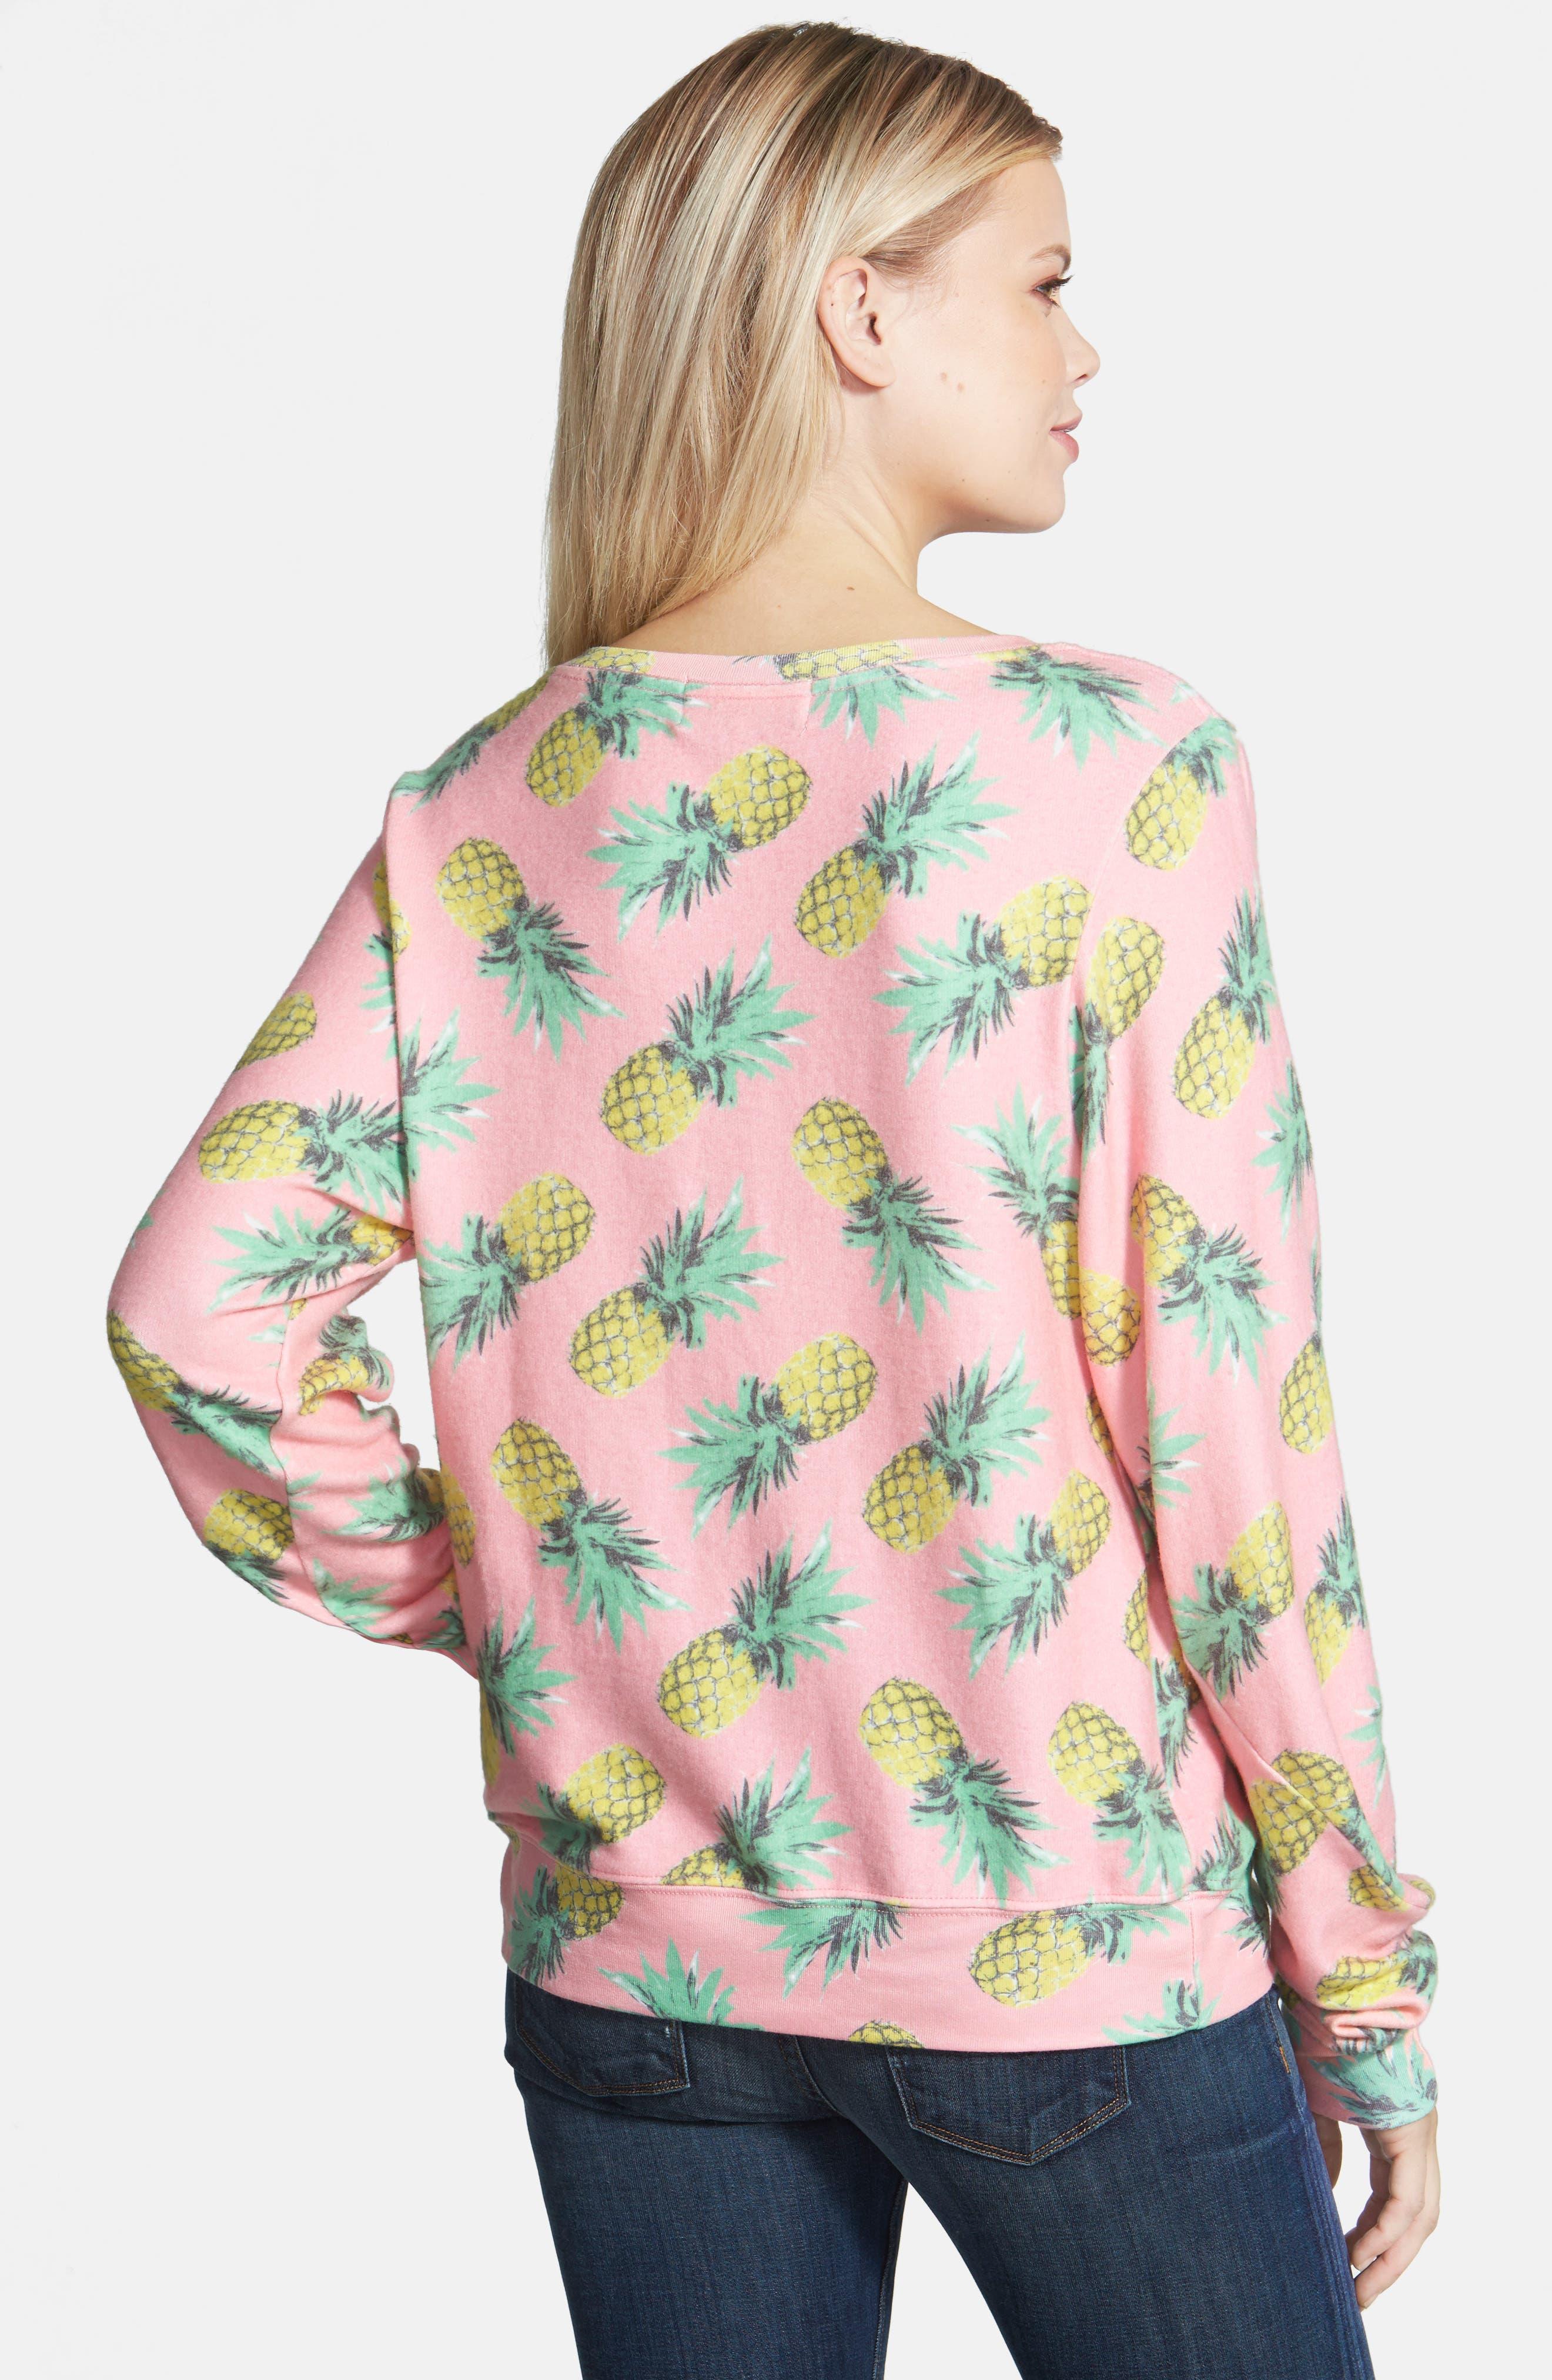 'Pineapple Palace' Sweatshirt,                             Alternate thumbnail 3, color,                             690